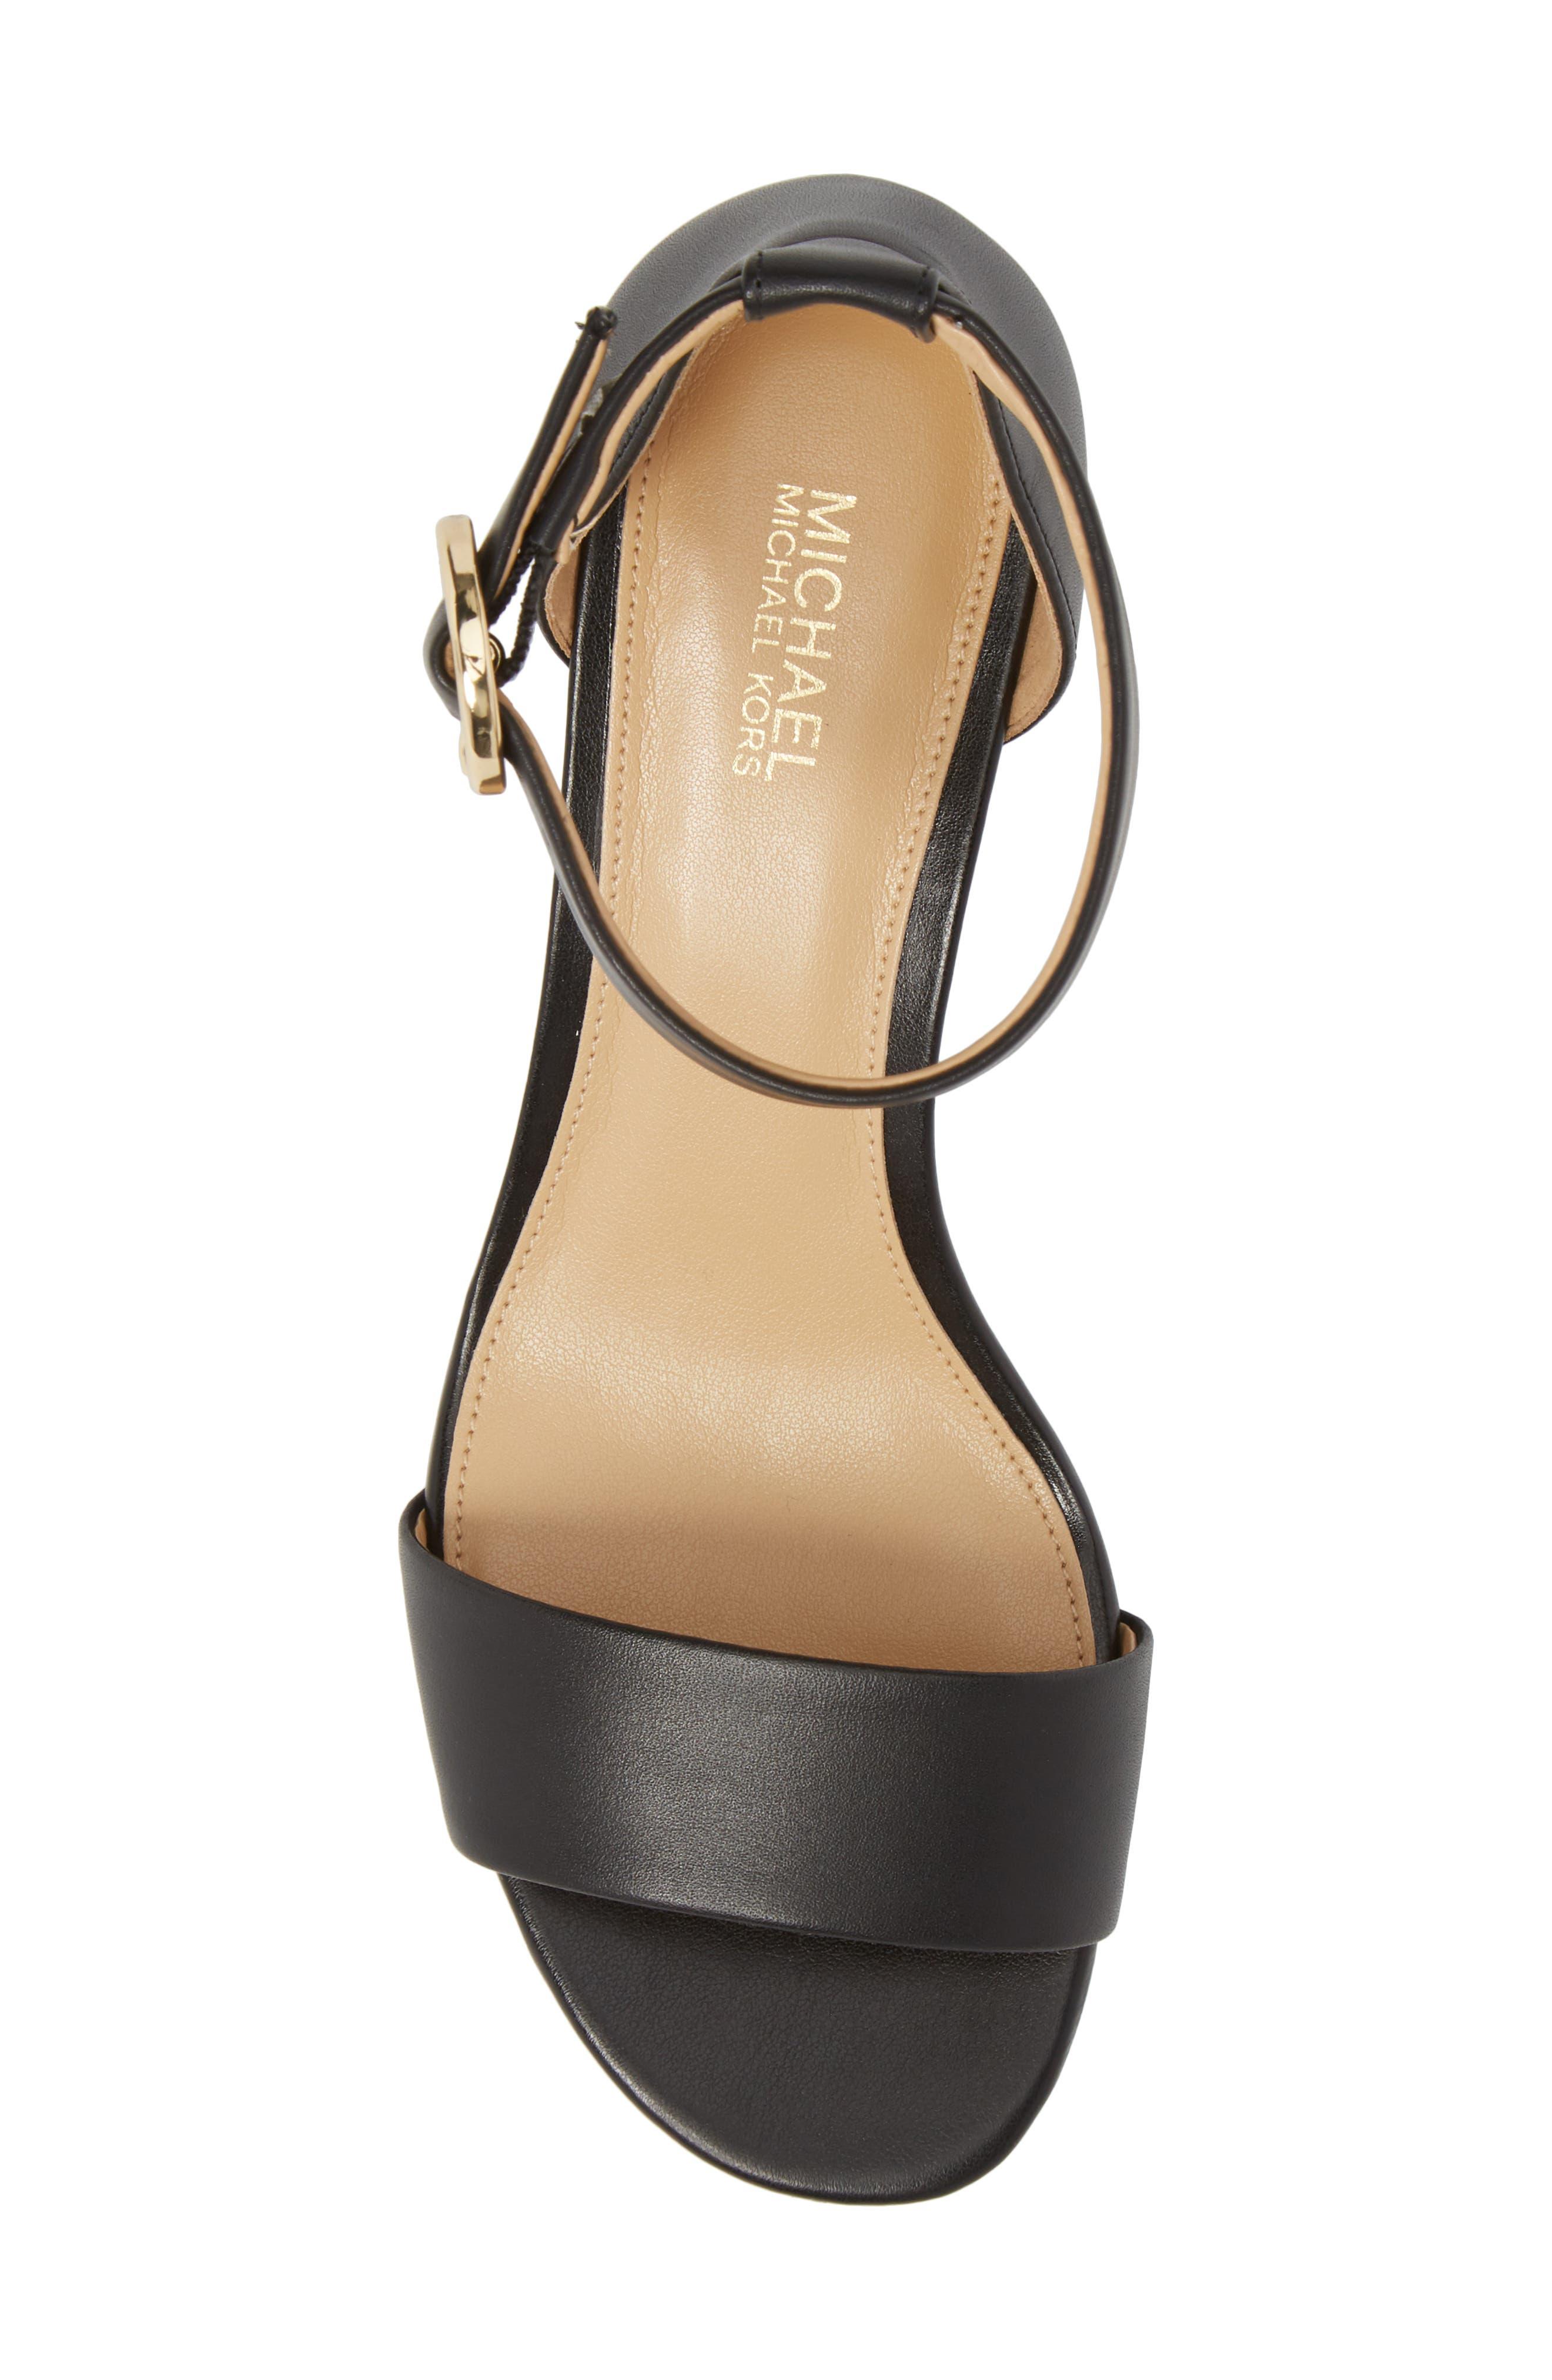 Lena Block Heel Sandal,                             Alternate thumbnail 5, color,                             BLACK